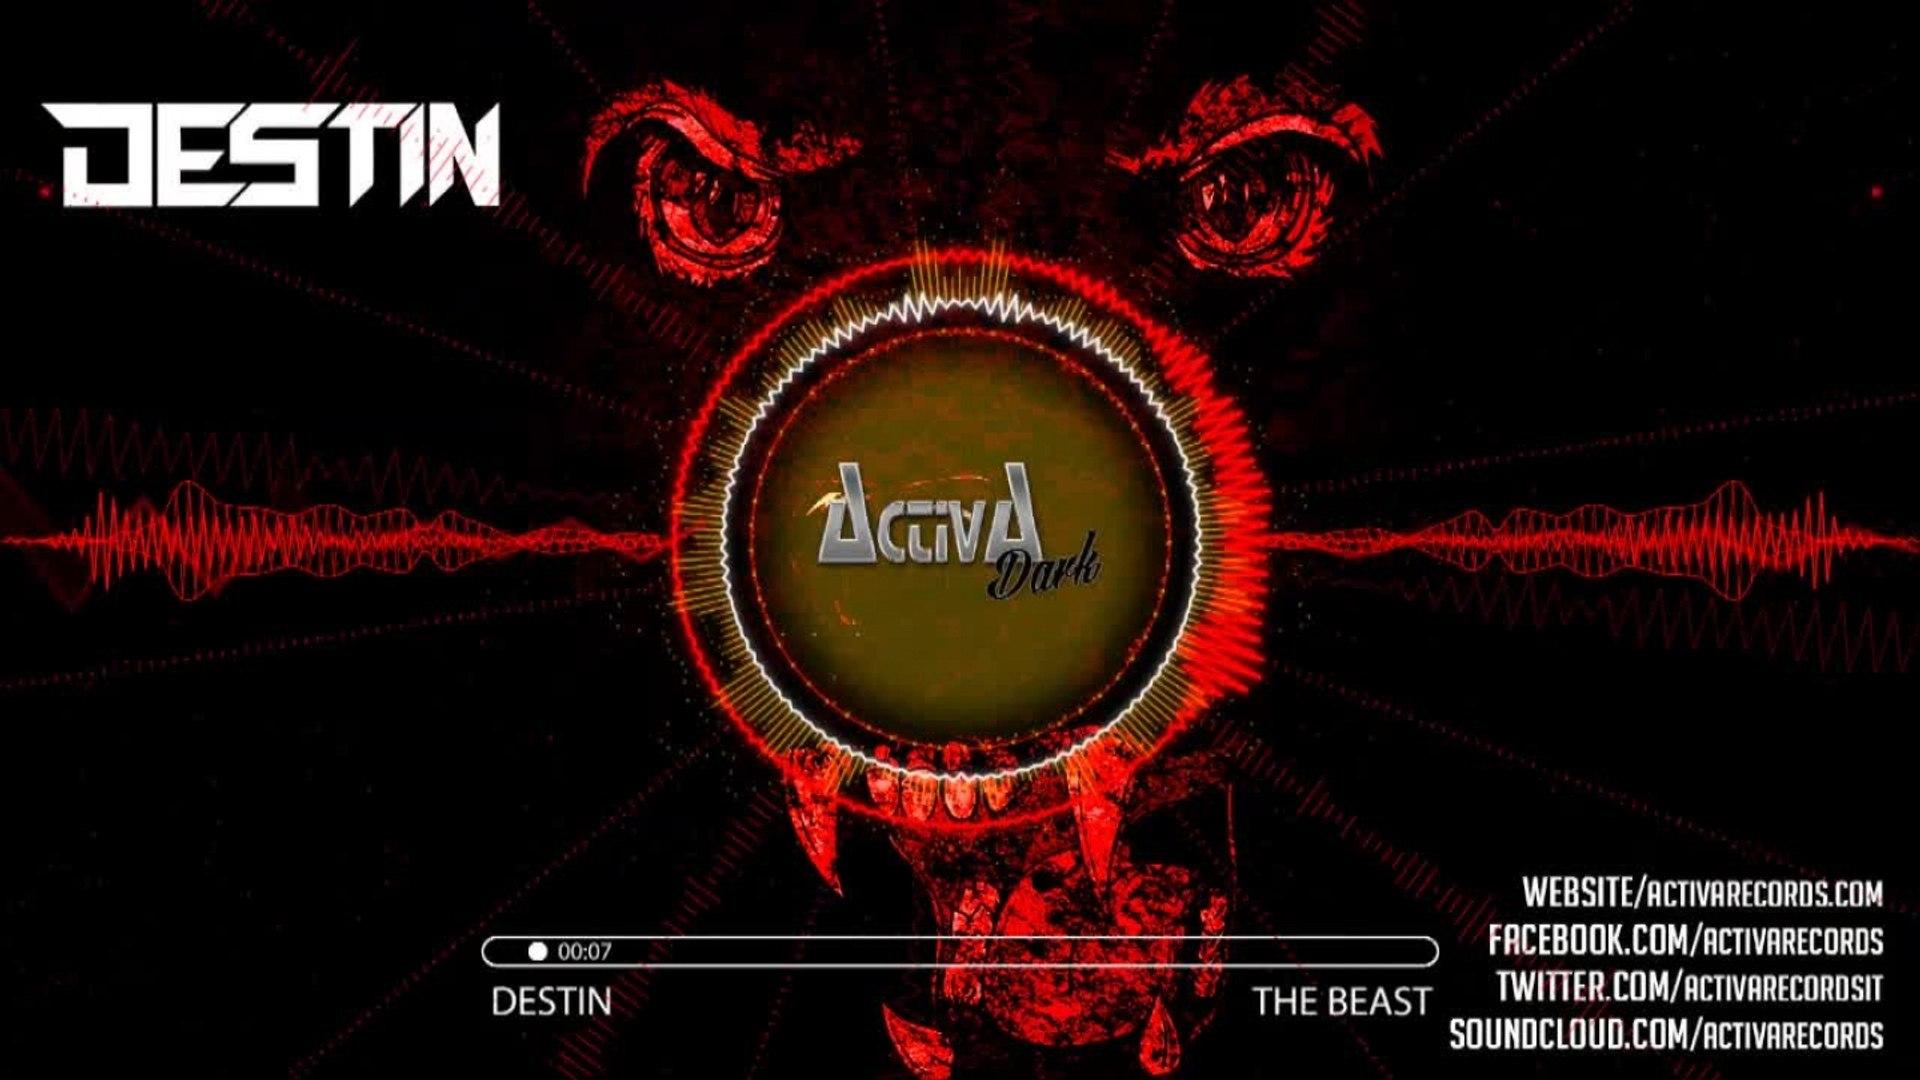 Destin - The Beast (Original Mix) - Official Preview (Activa Dark)